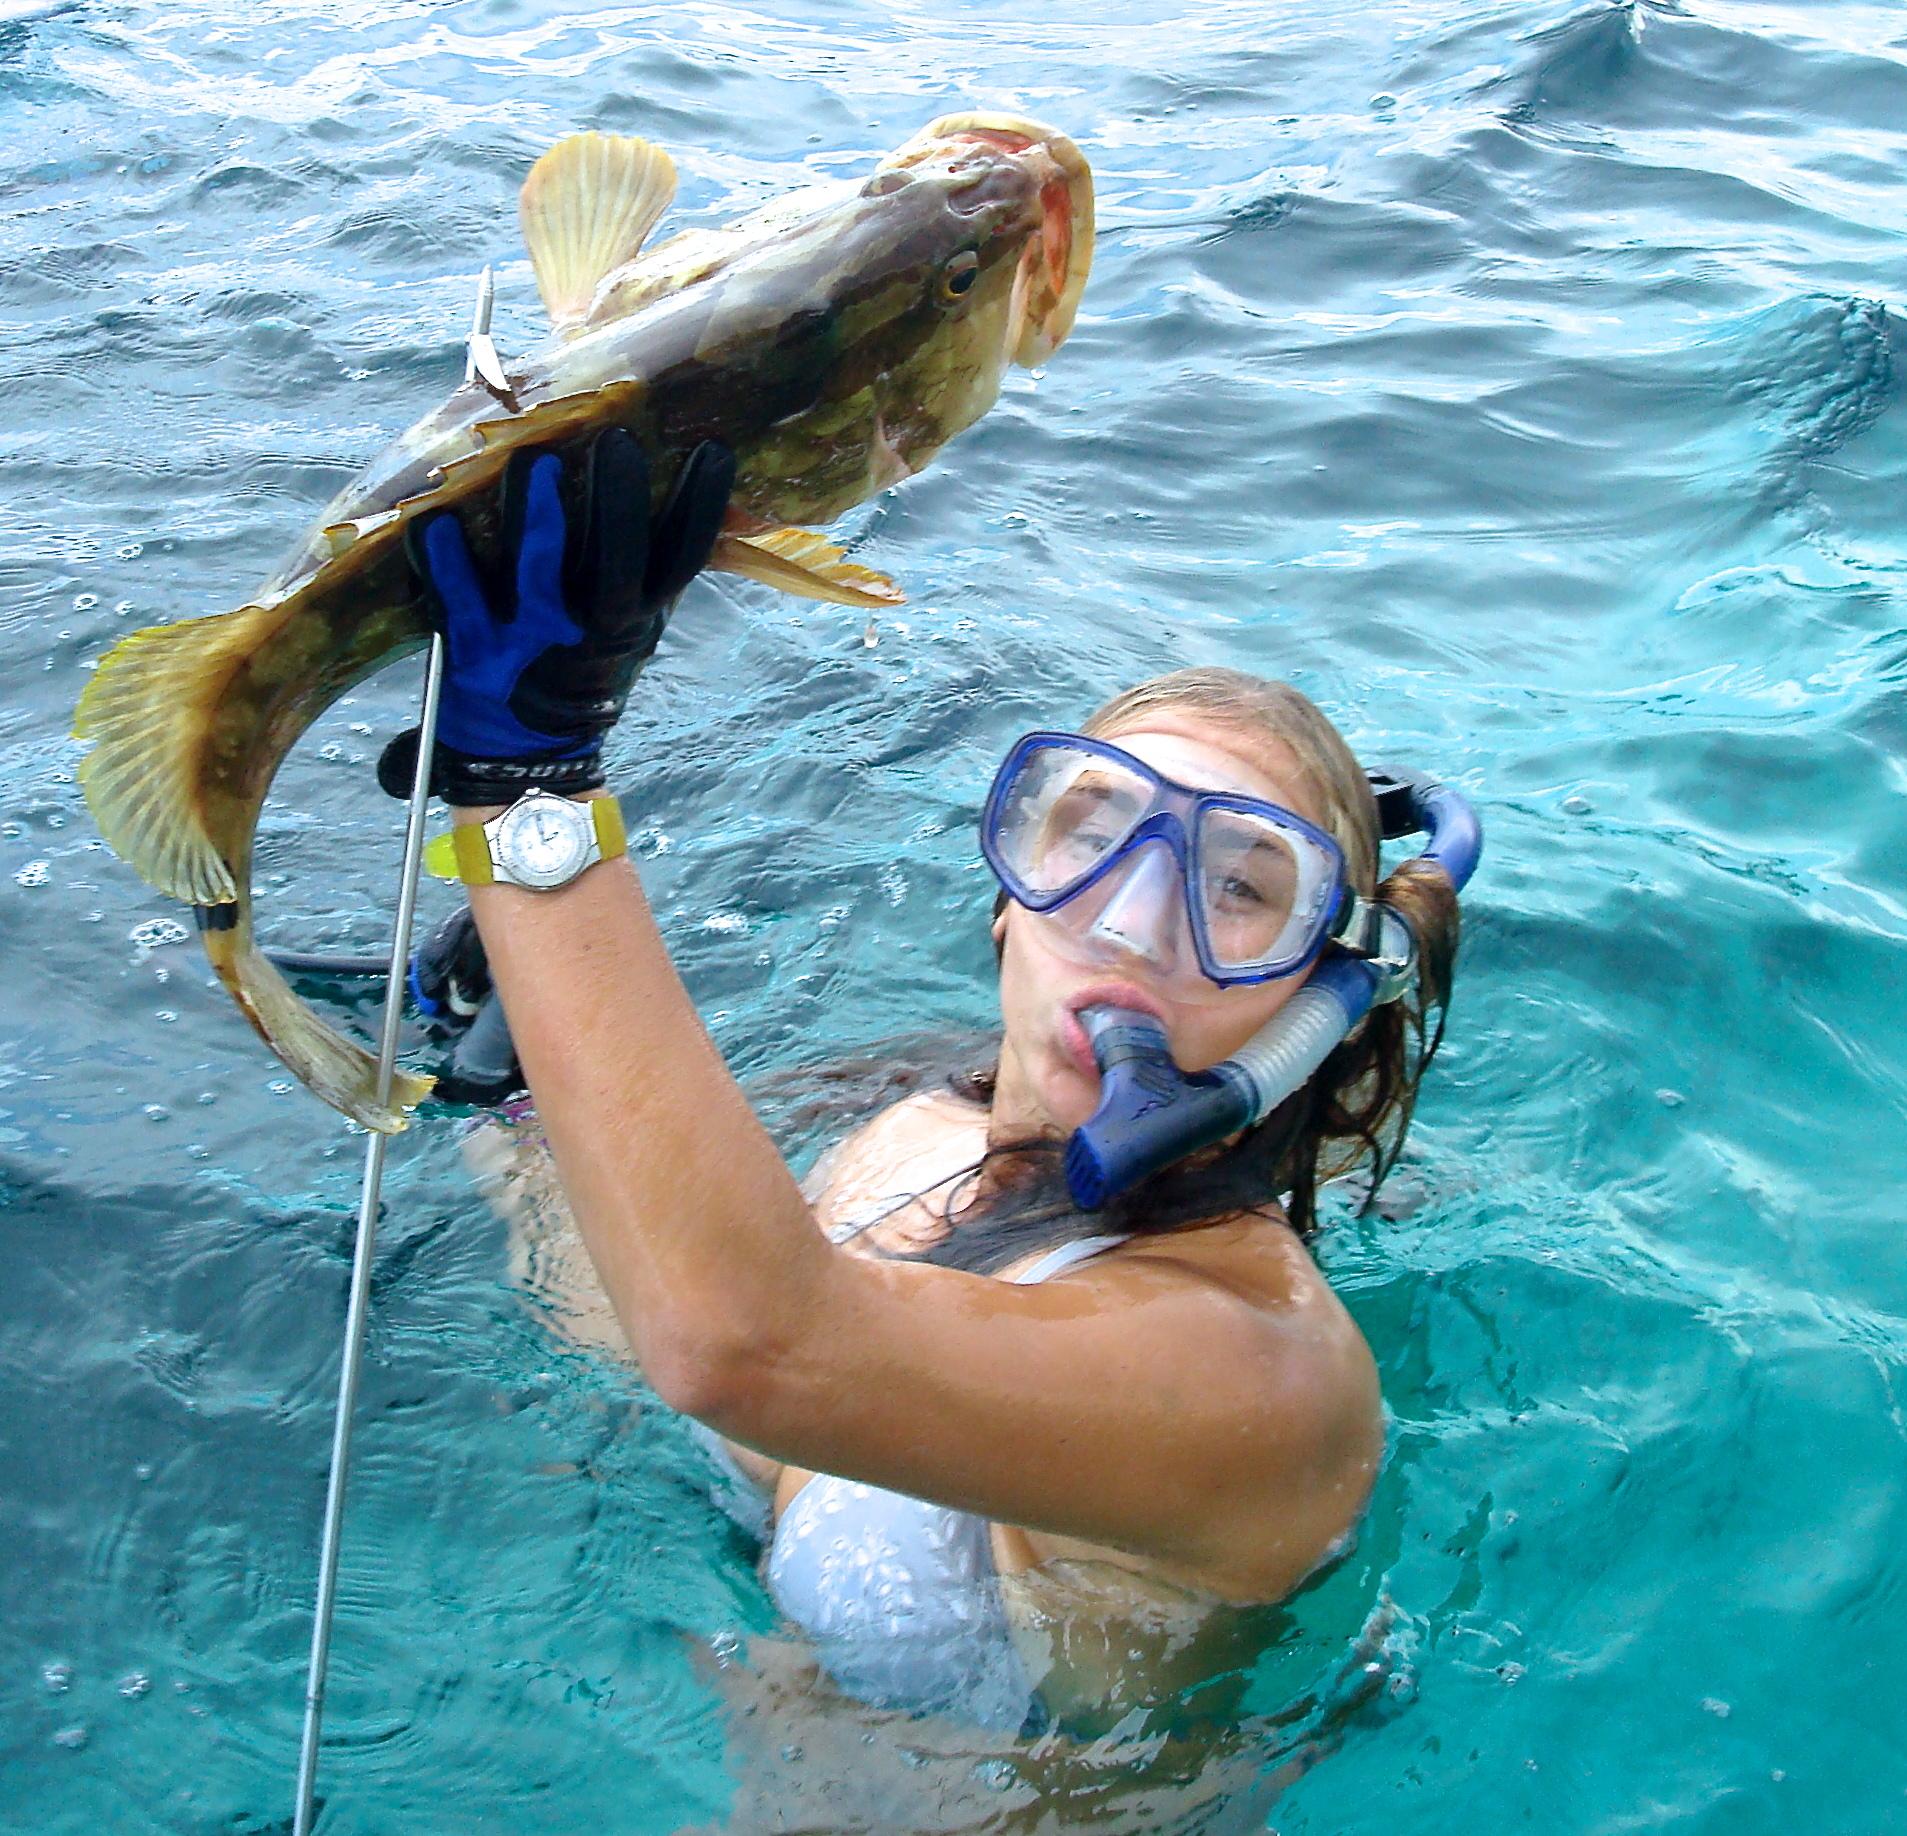 Bahamas real estate fishing in the bahamas for Fishing in the bahamas